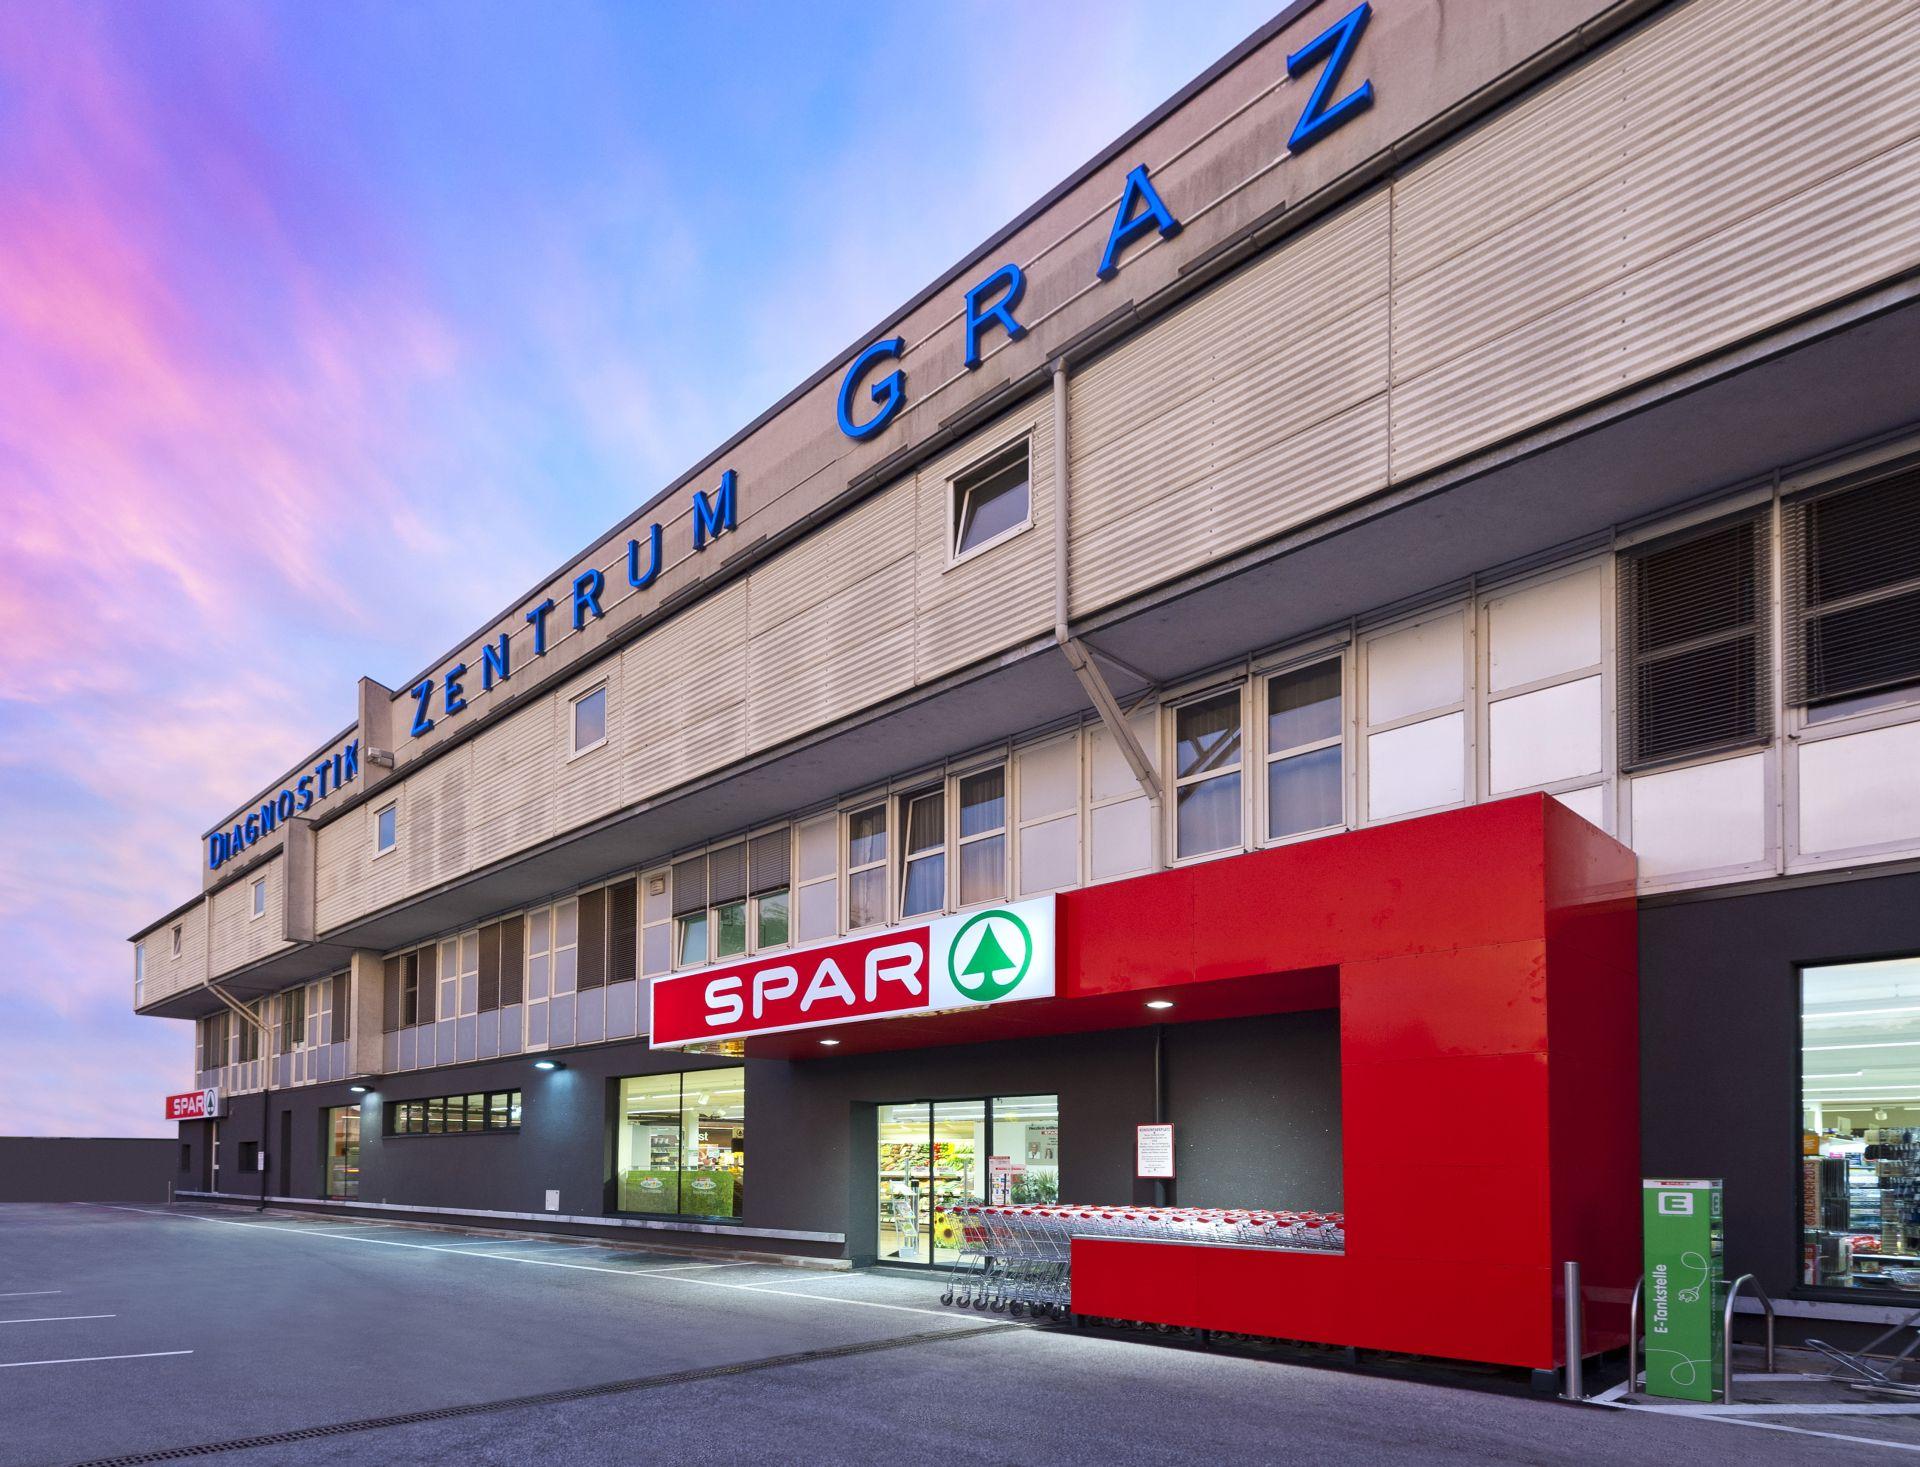 atrium - Bildungsforum Mariatrost